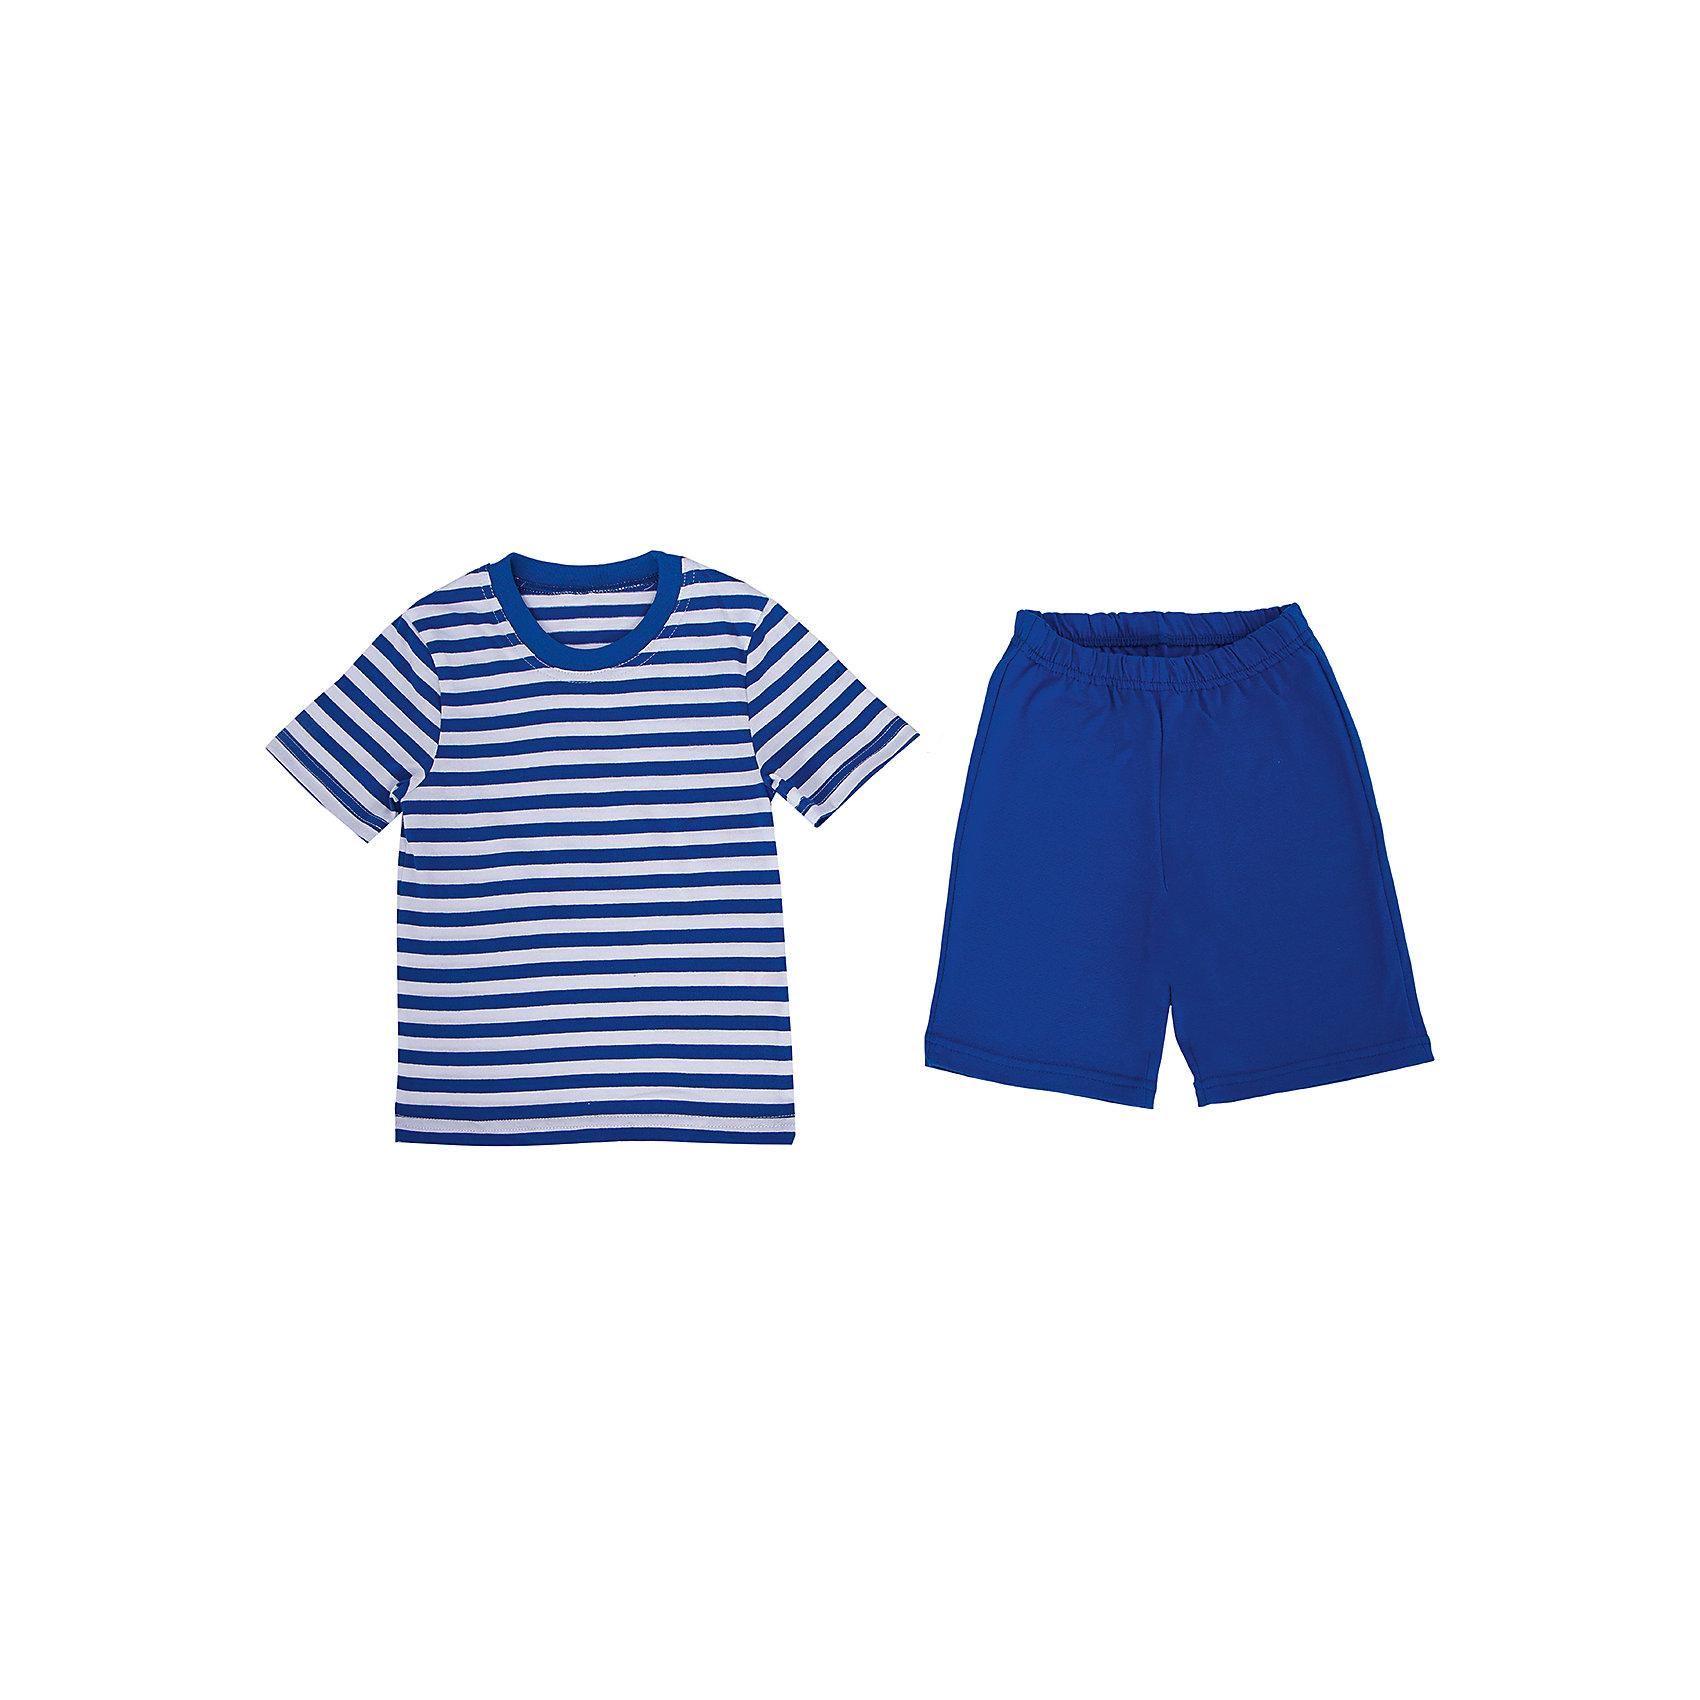 Пижама для мальчика АпрельПижама для мальчика от известного бренда Апрель.<br><br>Состав:<br>хлопок 100%, хлопок 95% + лайкра 5%<br><br>Ширина мм: 281<br>Глубина мм: 70<br>Высота мм: 188<br>Вес г: 295<br>Цвет: синий<br>Возраст от месяцев: 60<br>Возраст до месяцев: 72<br>Пол: Мужской<br>Возраст: Детский<br>Размер: 116,92,110,104,98<br>SKU: 4768105